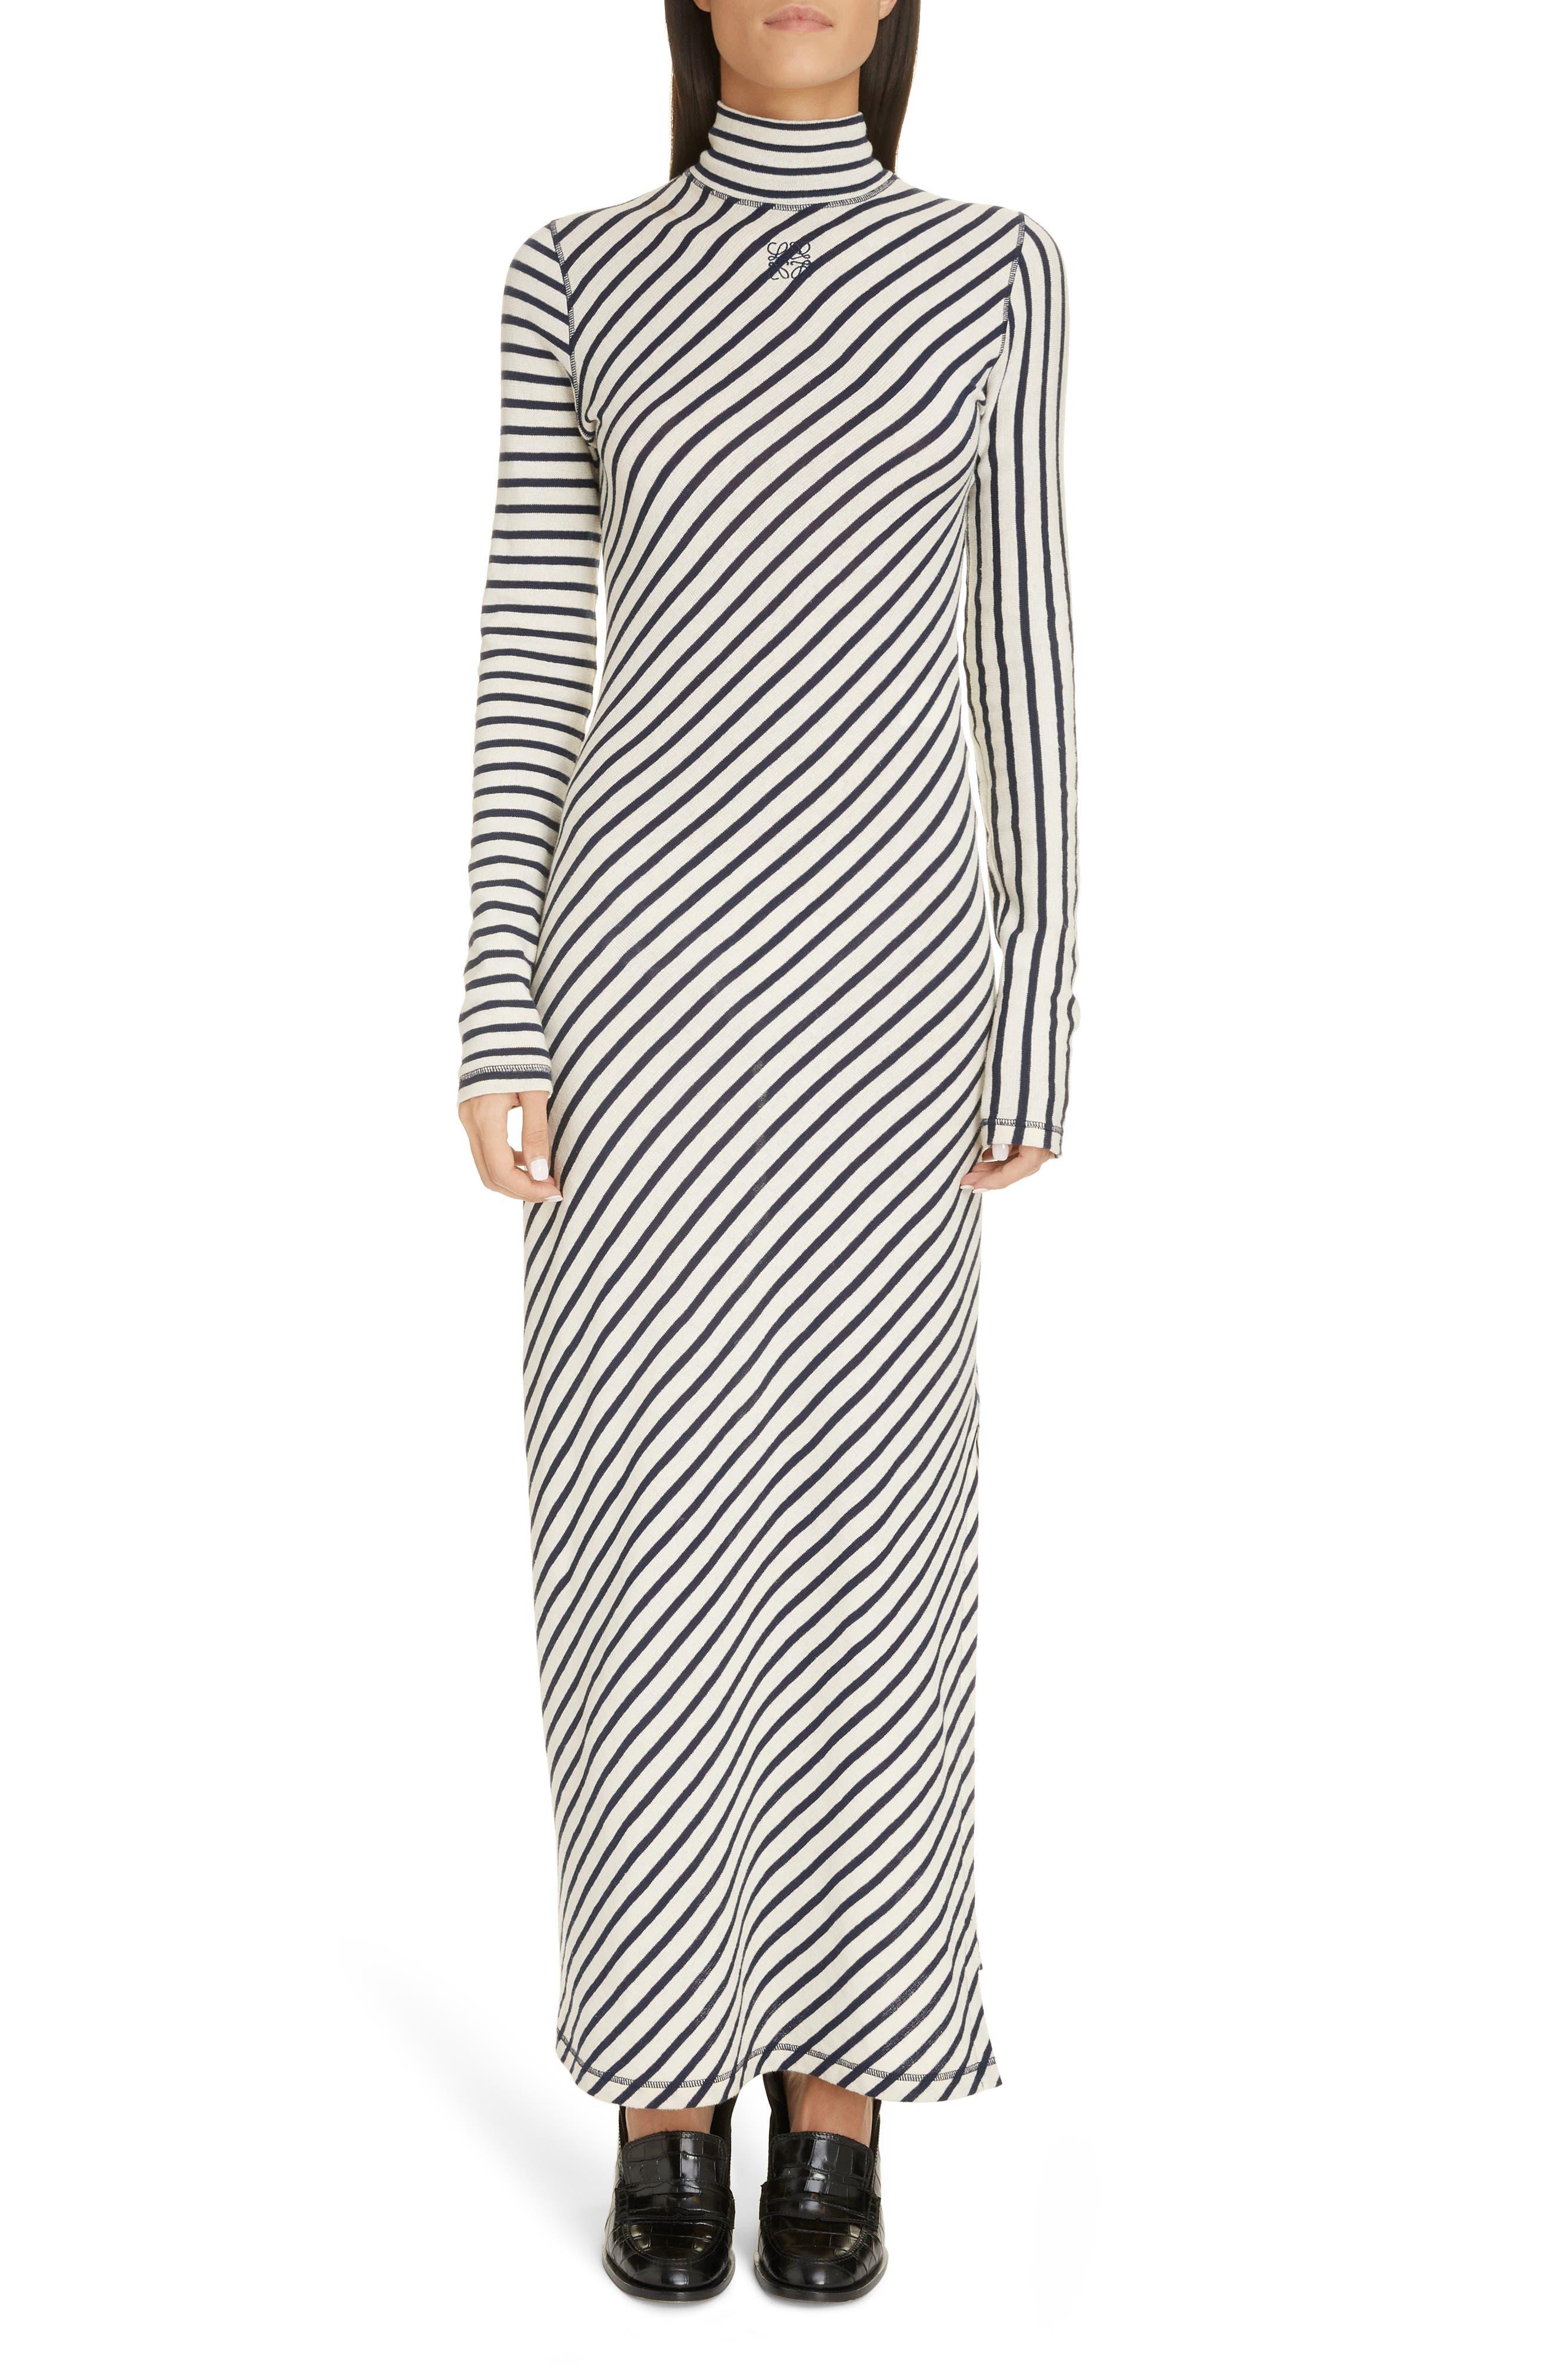 Loewe Dresses Stripe Long Sleeve Cotton Jersey Maxi Dress